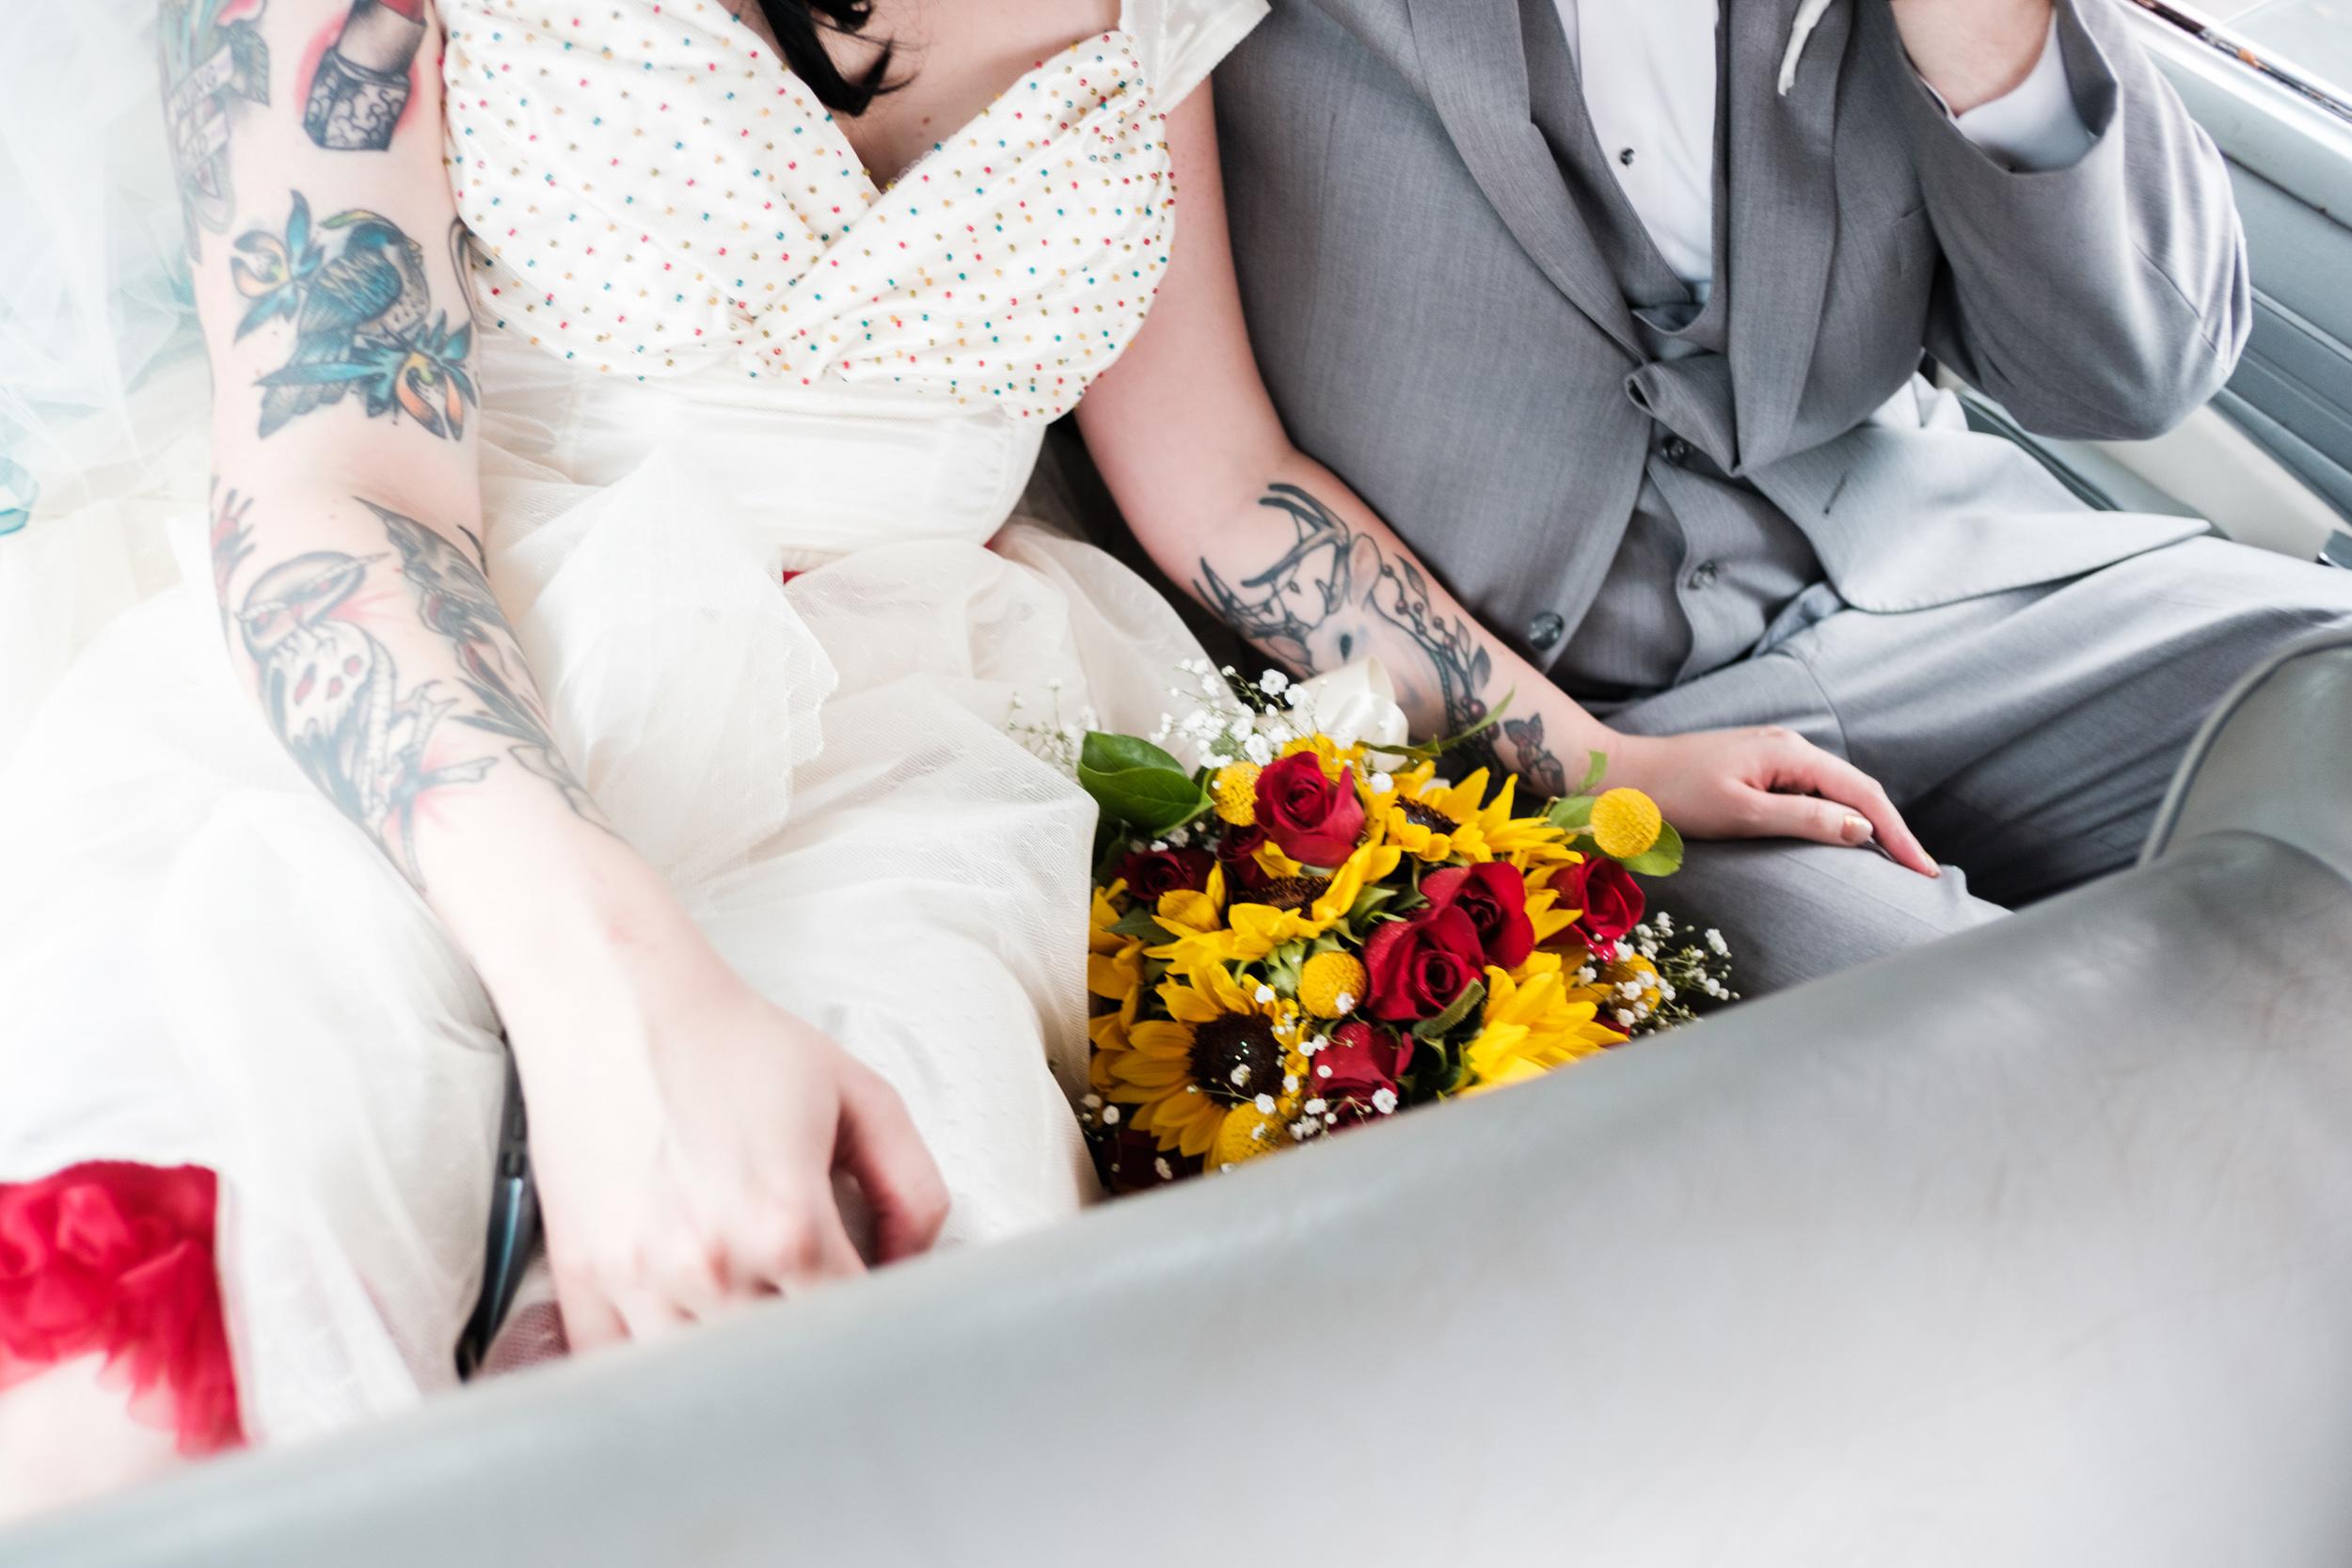 Christian & Sarah wedding photography by Brian milo-183.jpg